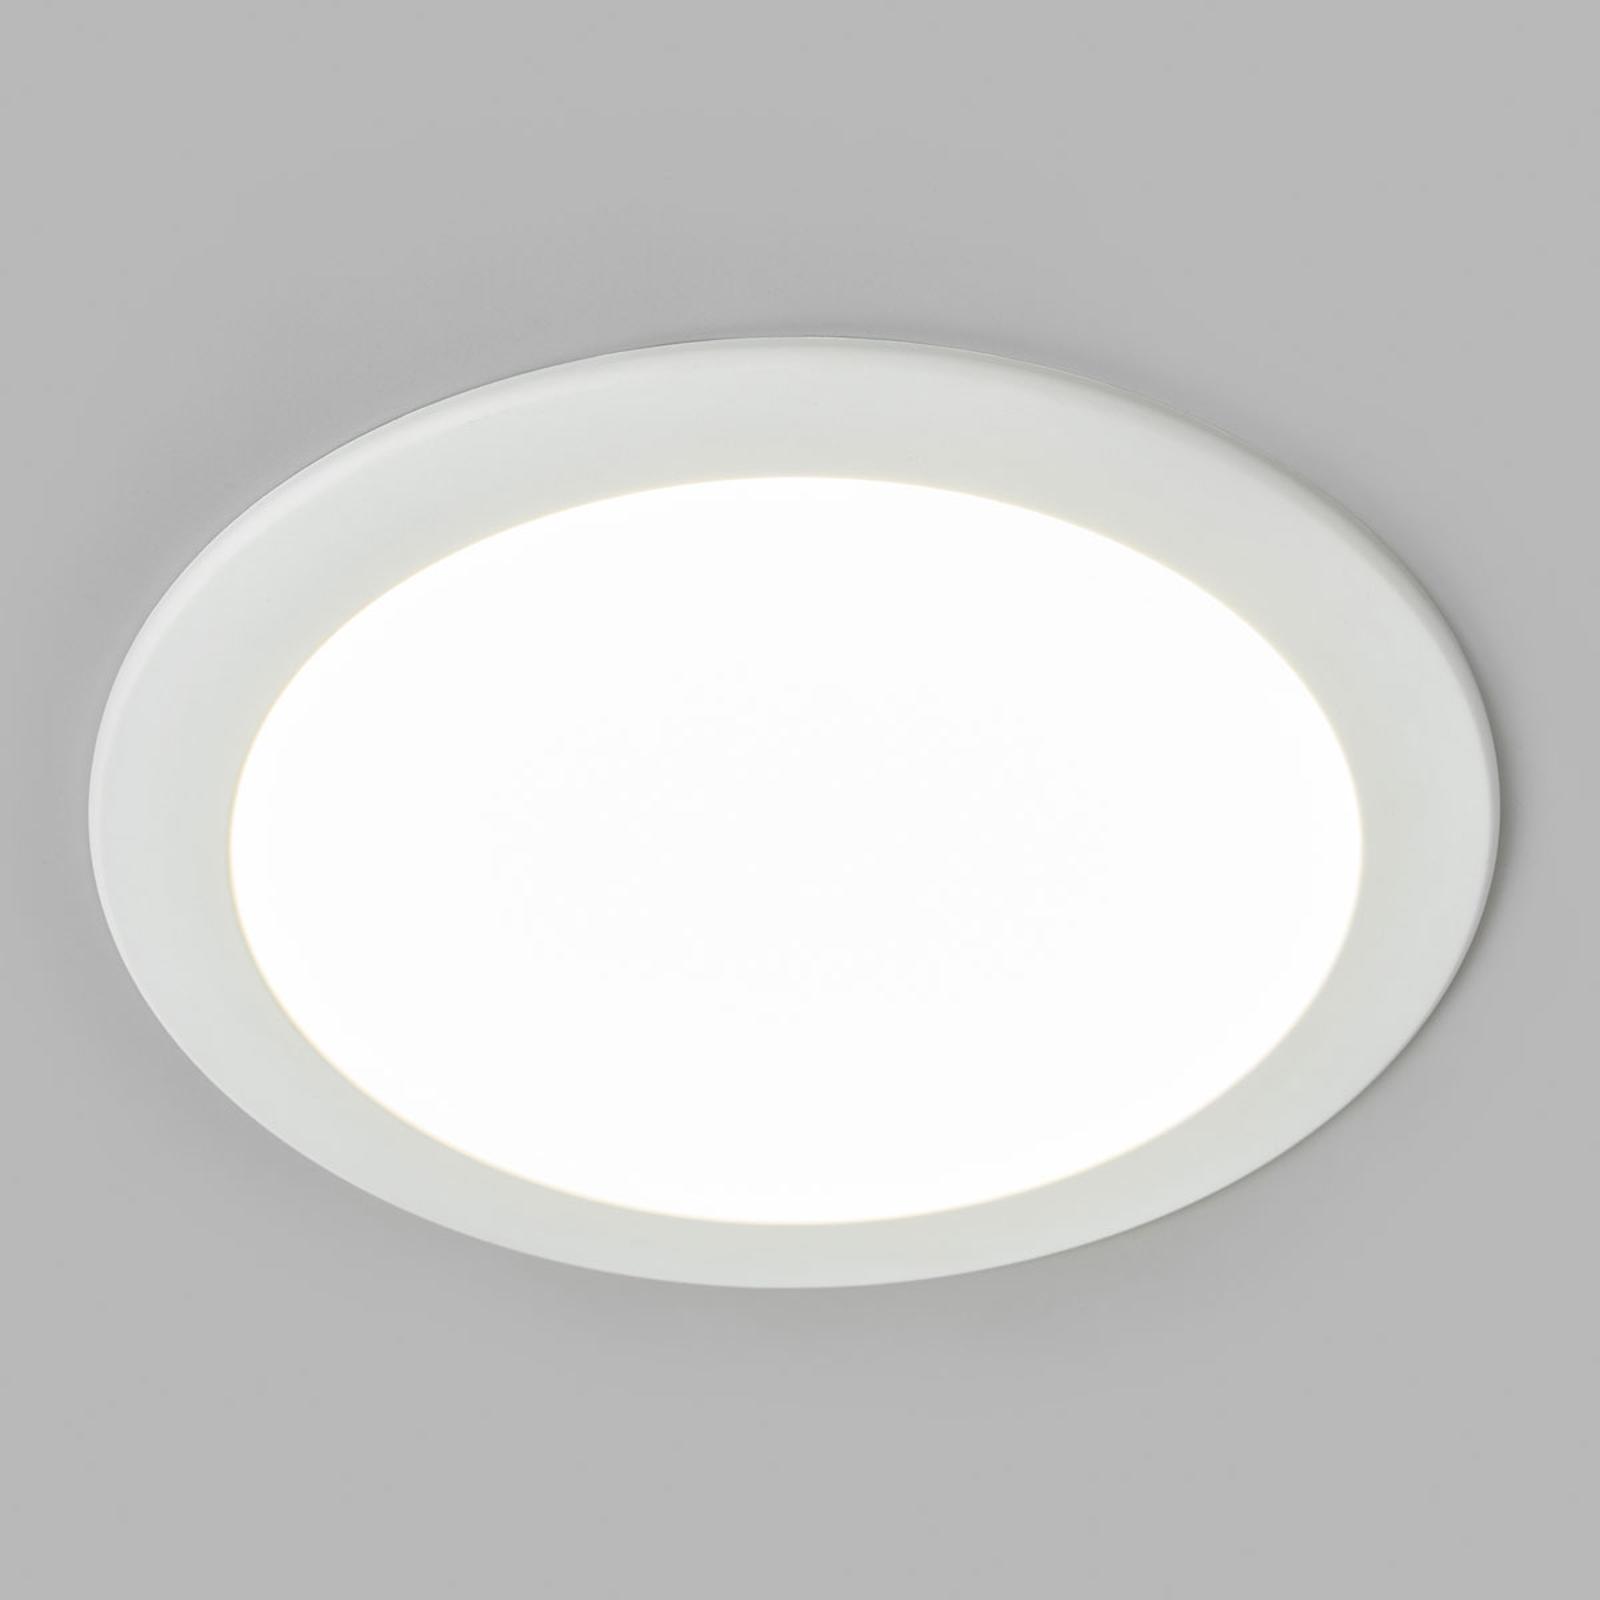 LED inbouwspot Joki wit 4.000K rond 24 cm